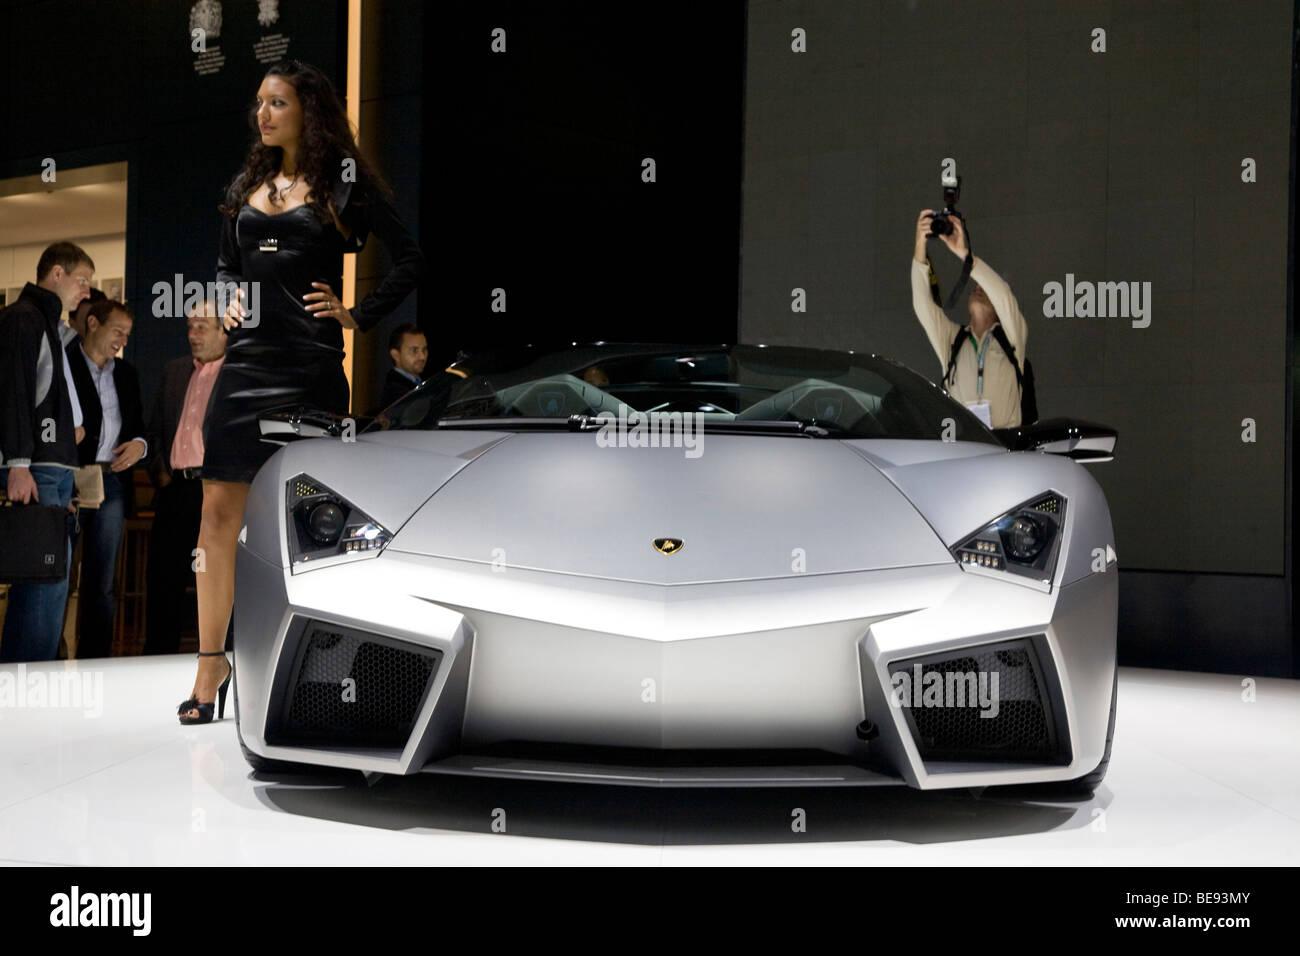 Lamborghini Reventon Roadster at a European motor show - Stock Image